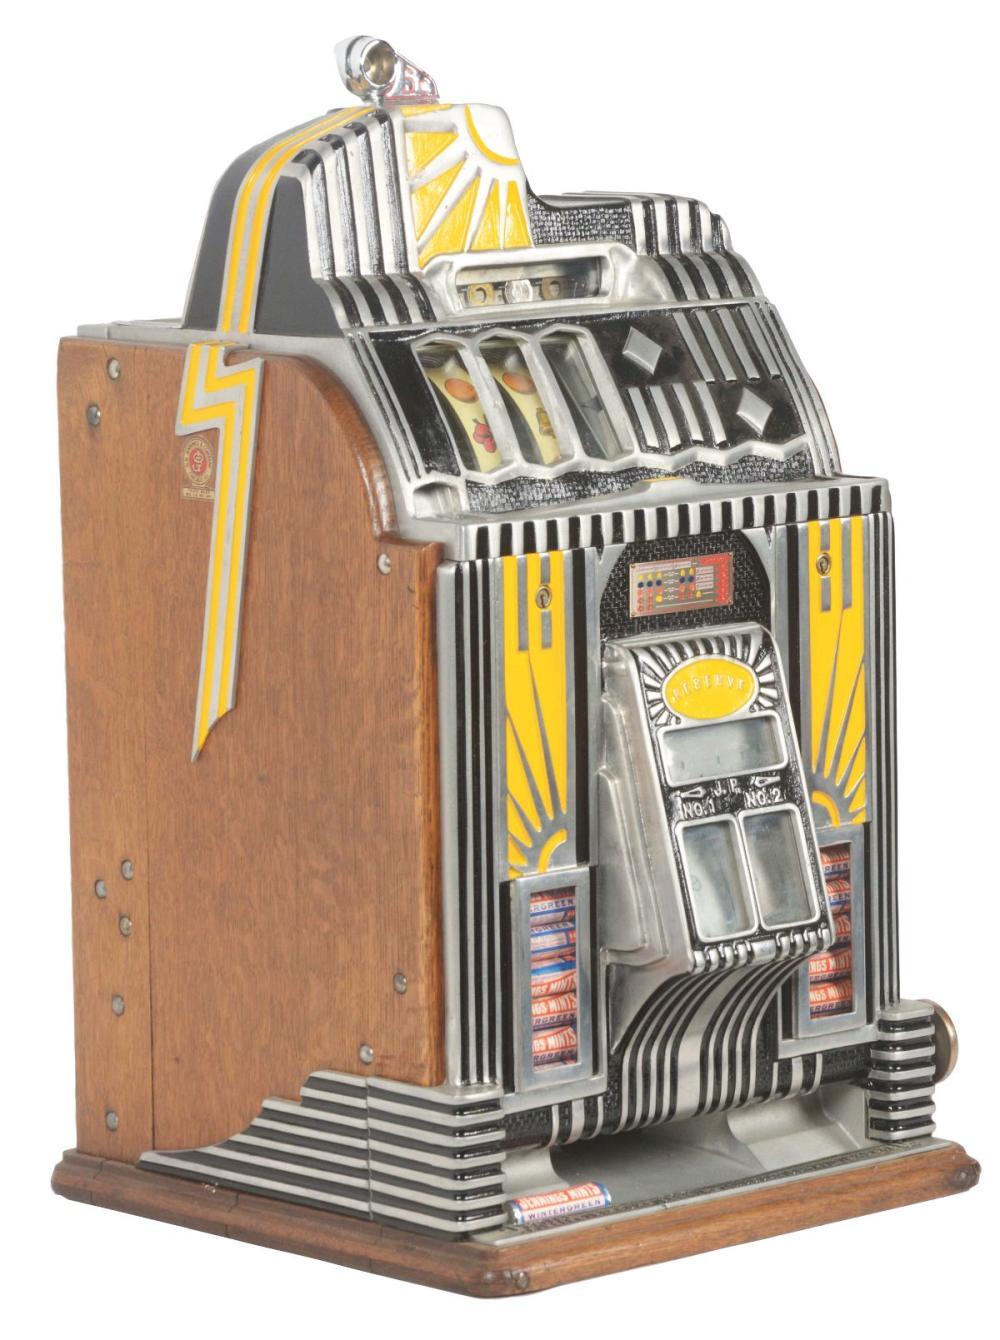 JENNINGS 5¢ CENTURY VENDOR SLOT MACHINE.